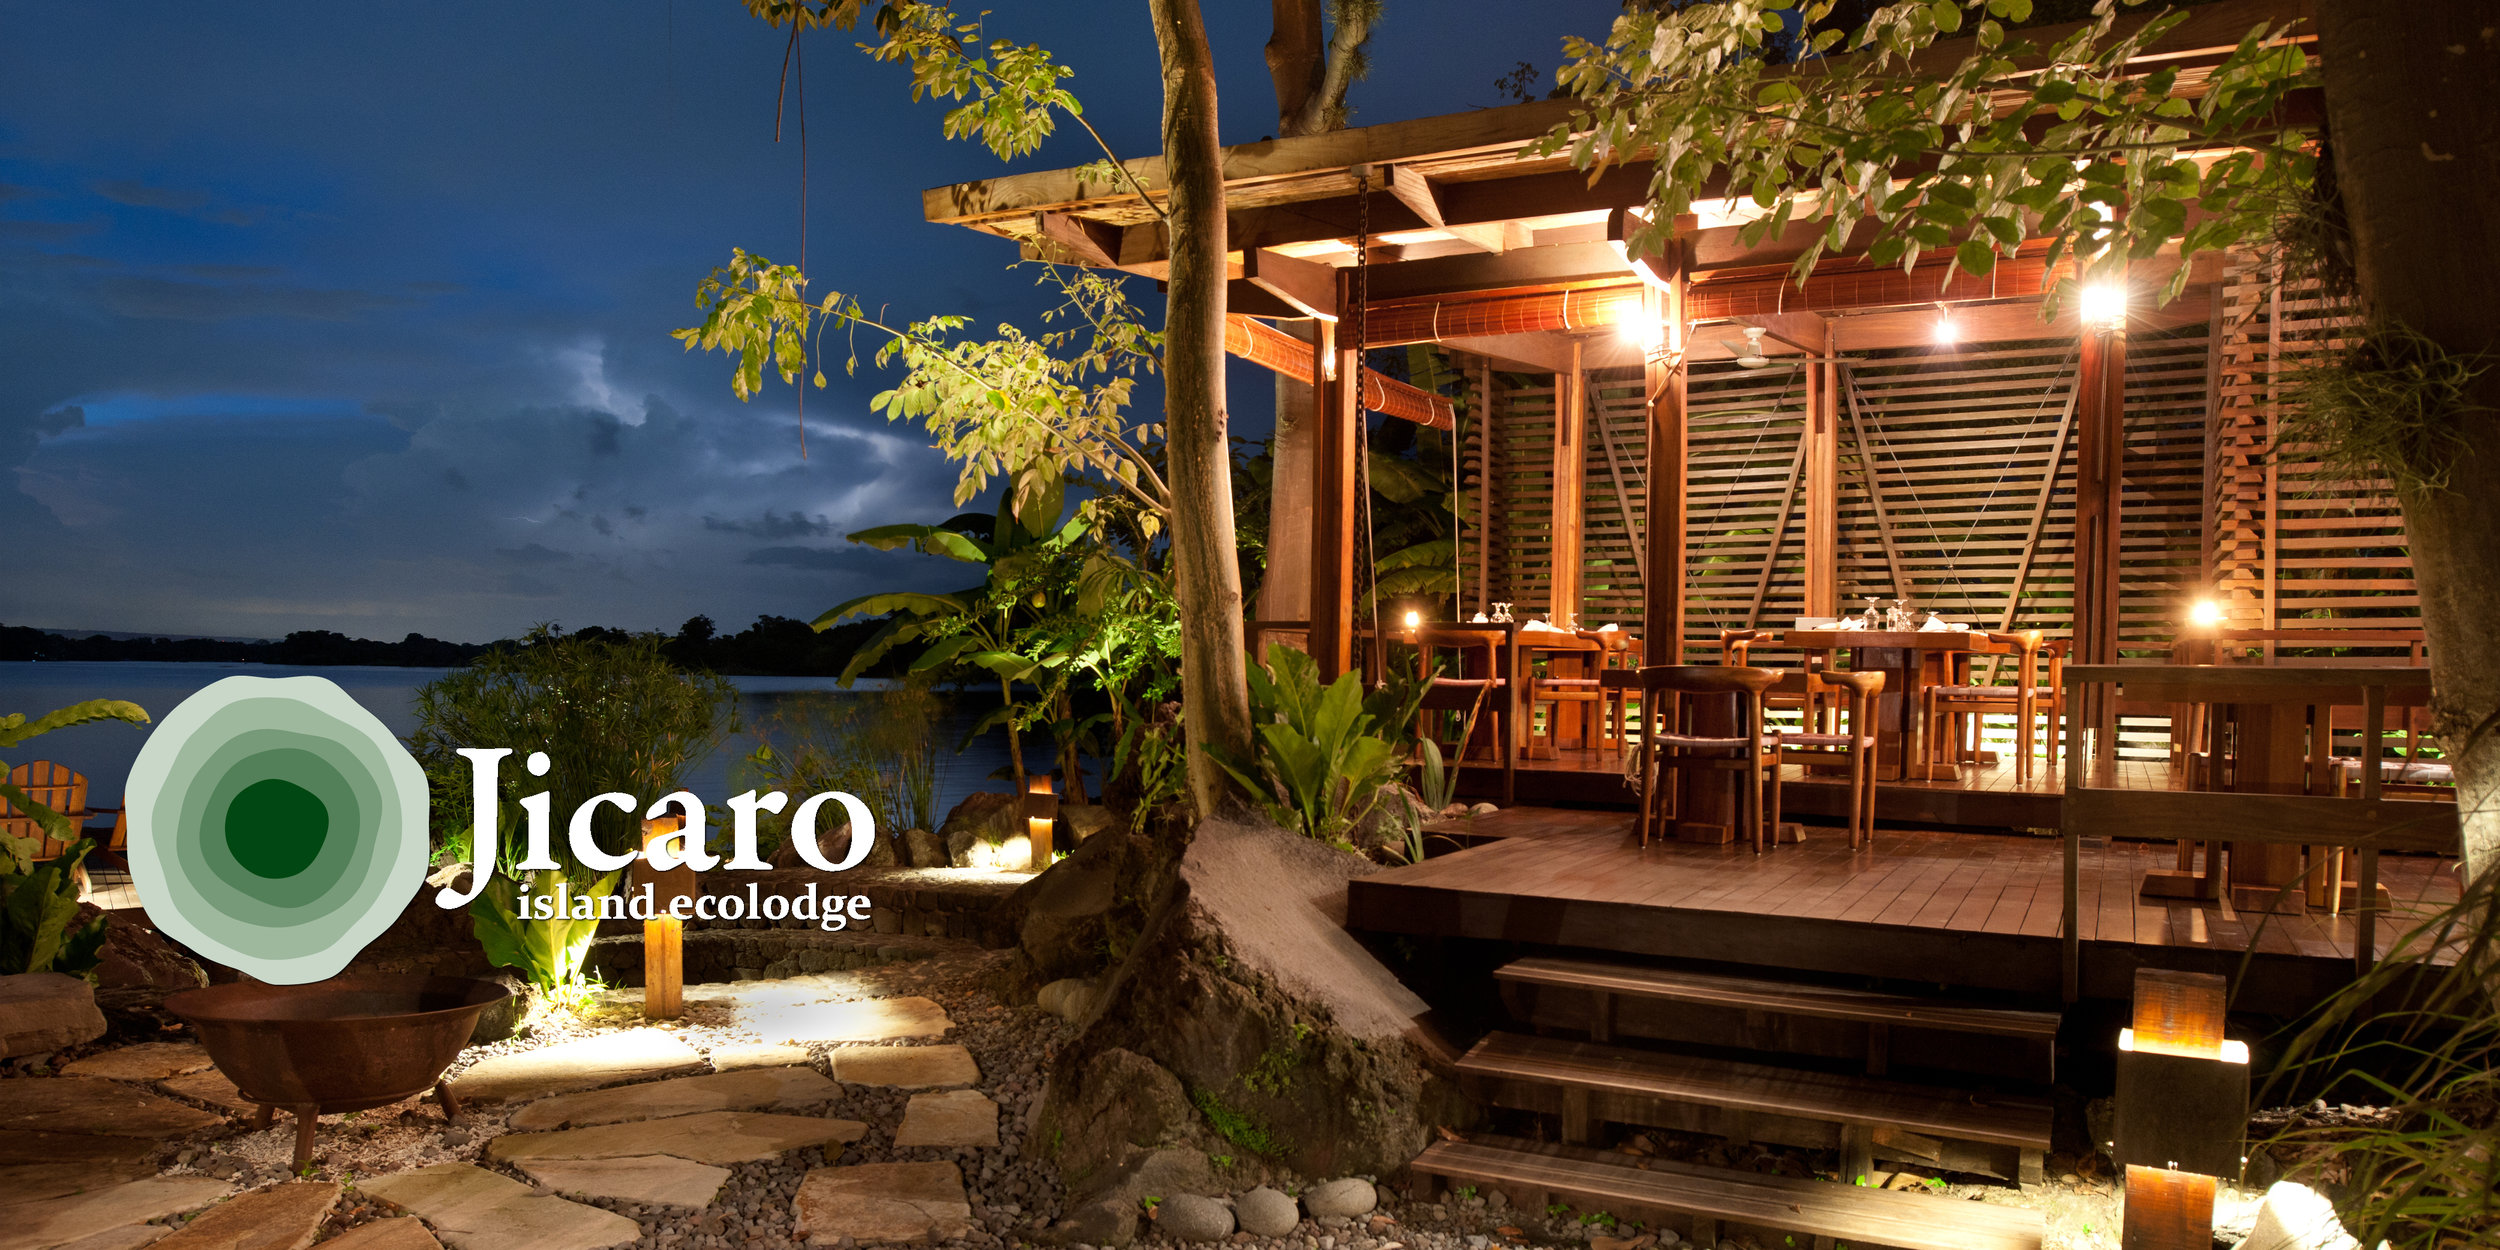 Jicaro Island Web Images 9.jpg